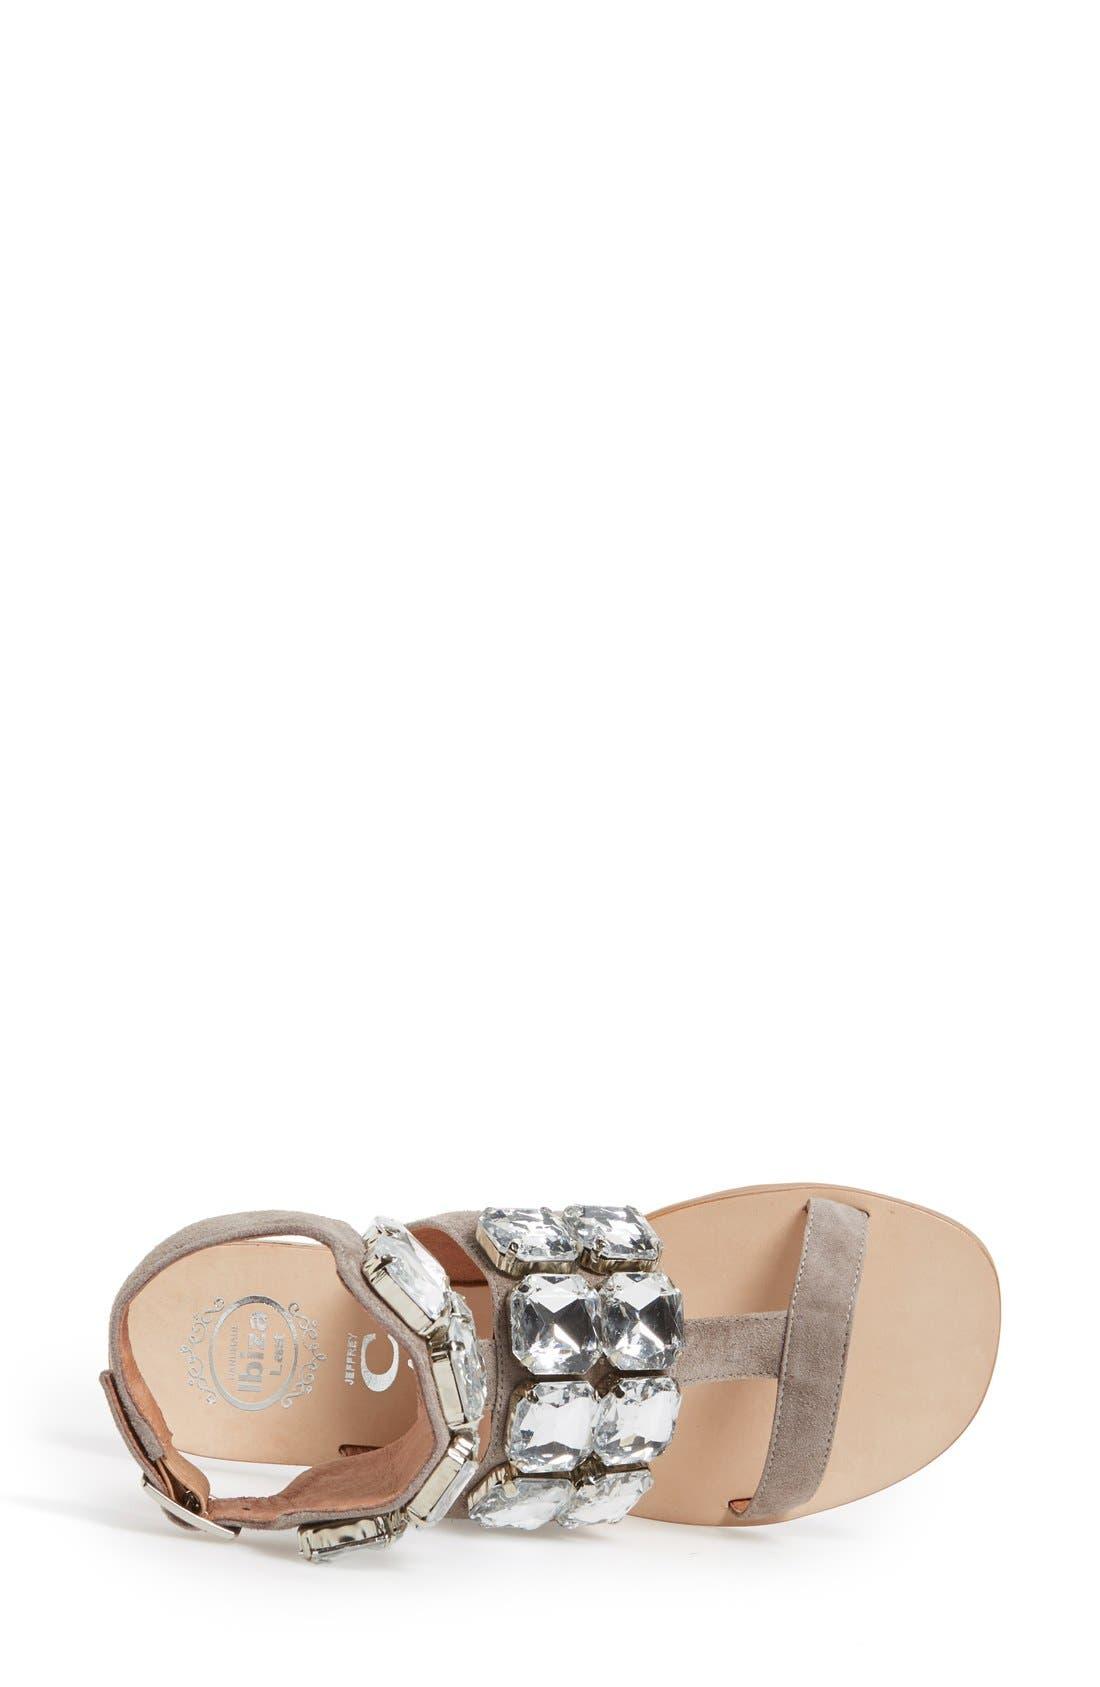 Alternate Image 3  - Jeffrey Campbell 'Sabita' Jeweled Suede Ankle Strap Sandal (Women)